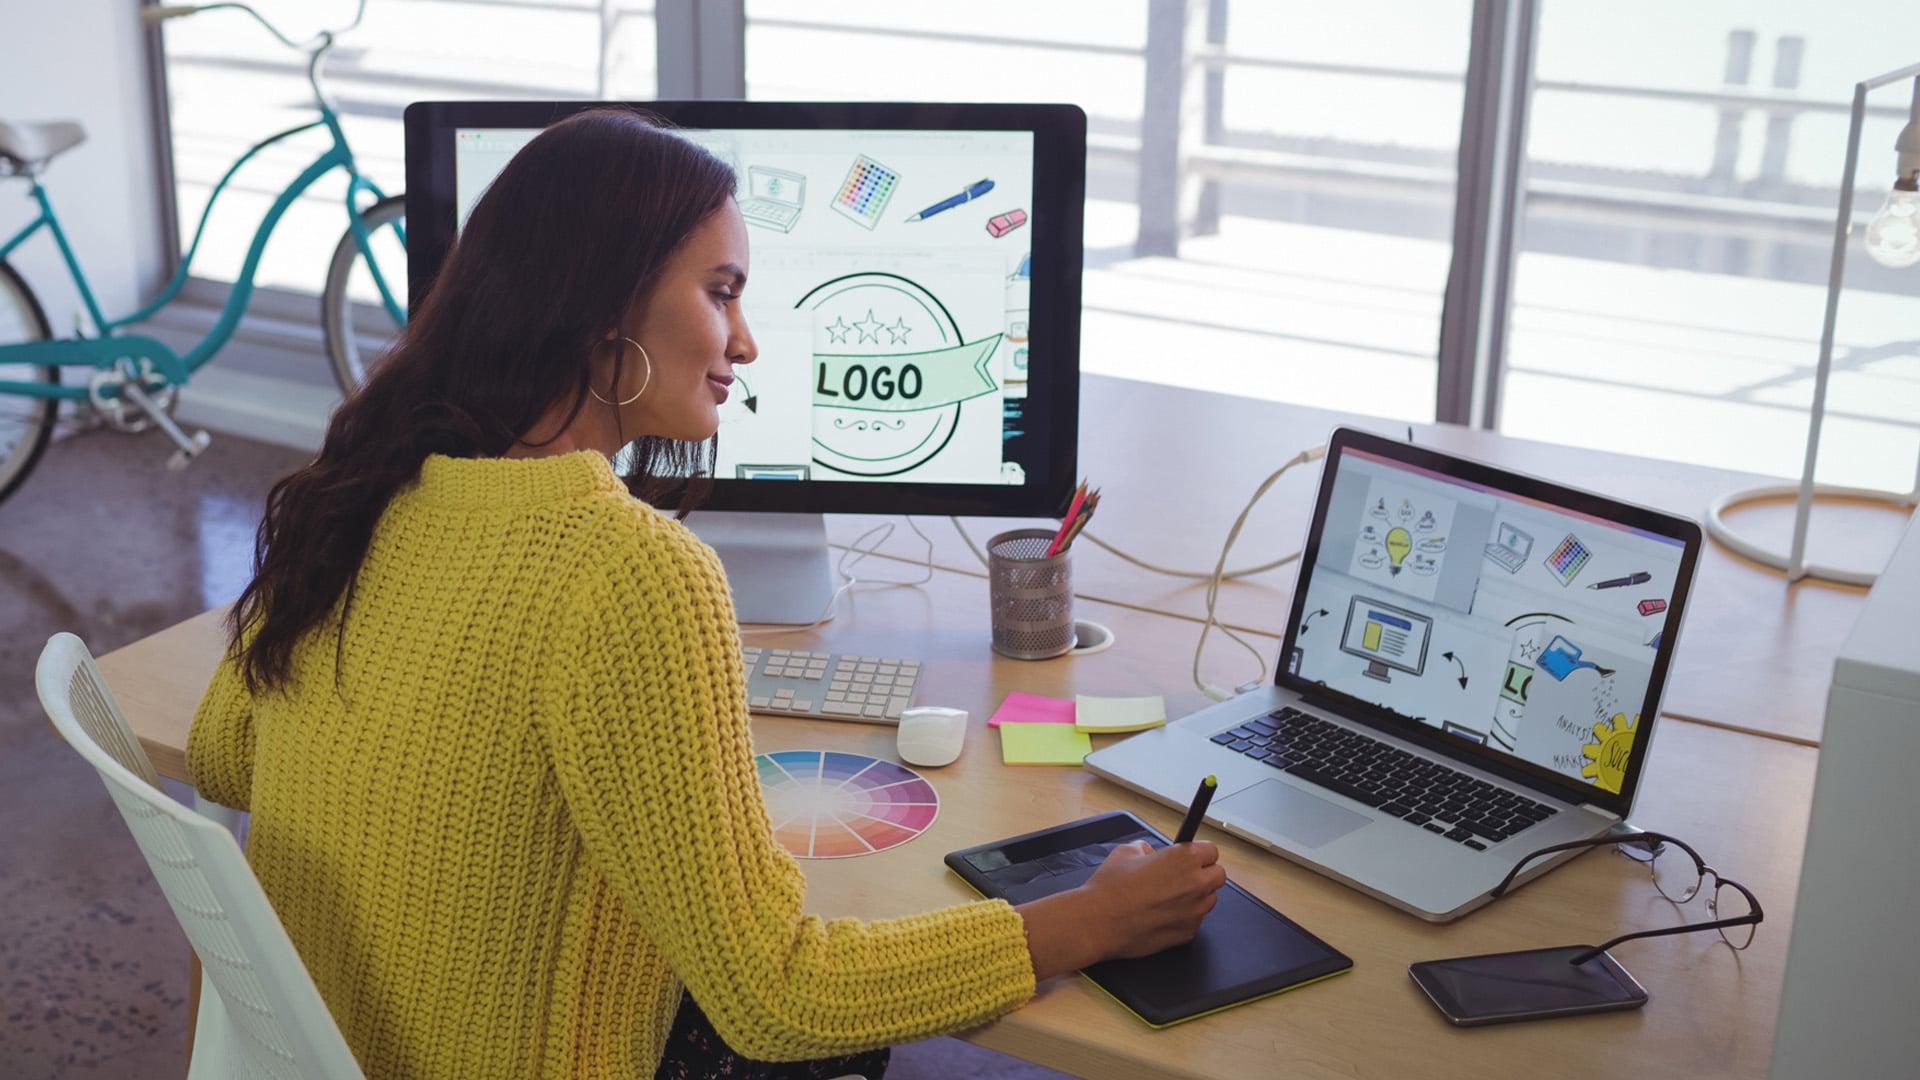 طراح موشن گرافیک کیست